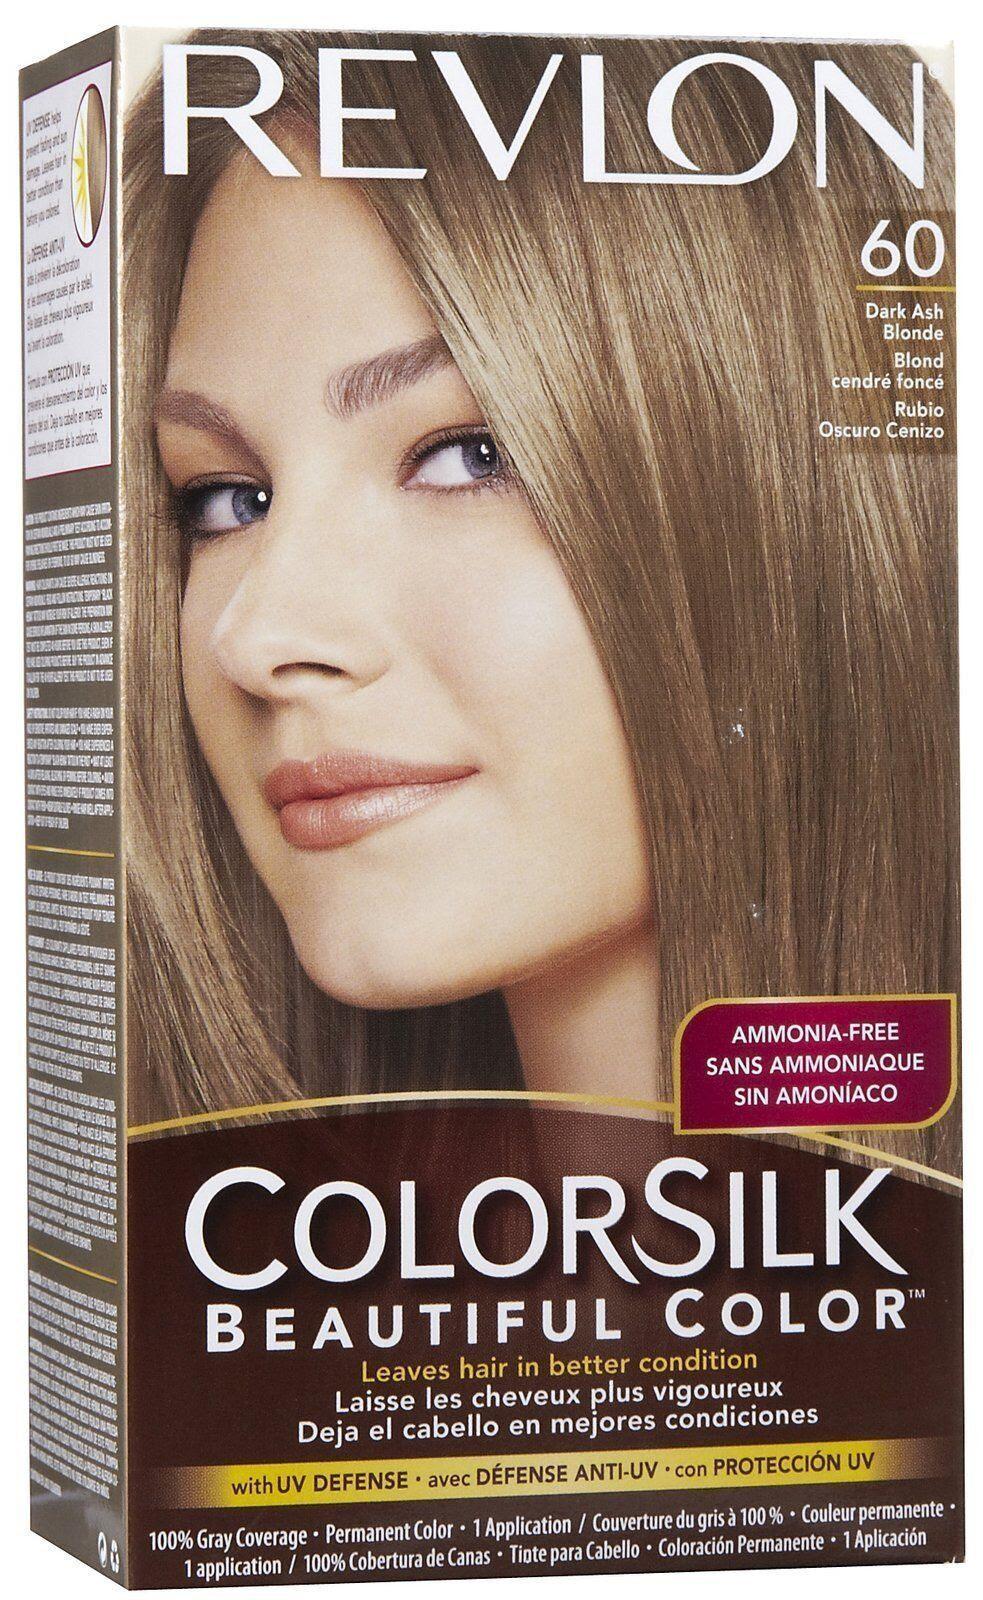 Revlon Colorsilk Hair Color, Dark Ash Blonde #60 -1 Kit | eBay